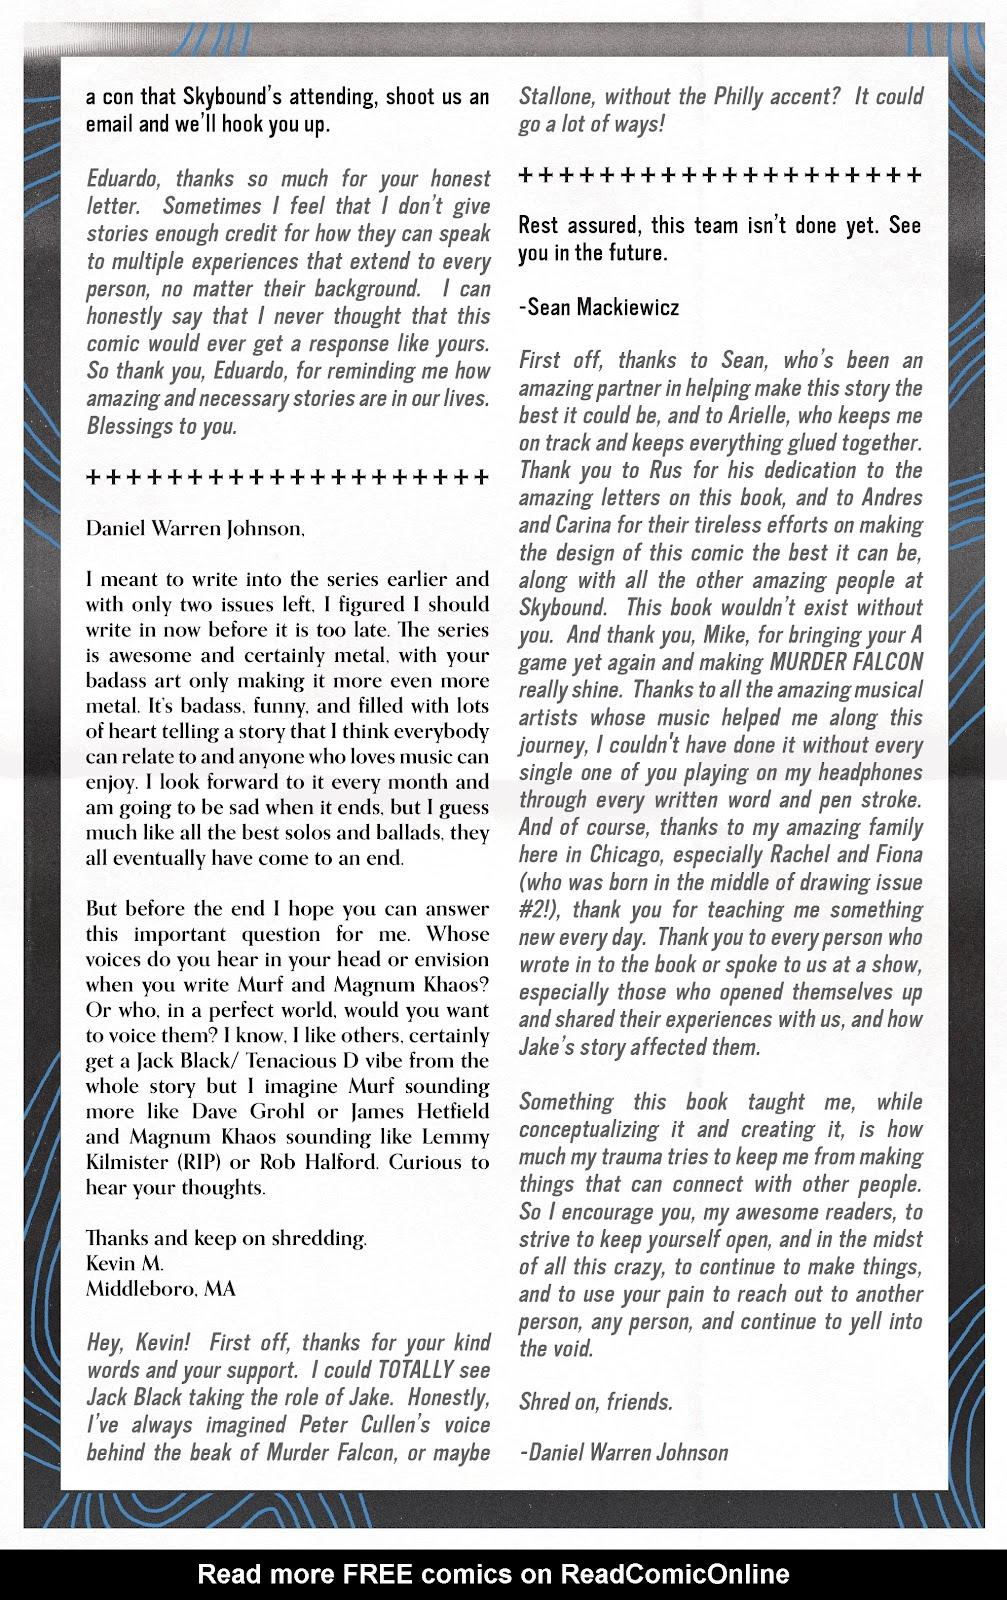 Read online Murder Falcon comic -  Issue #8 - 29